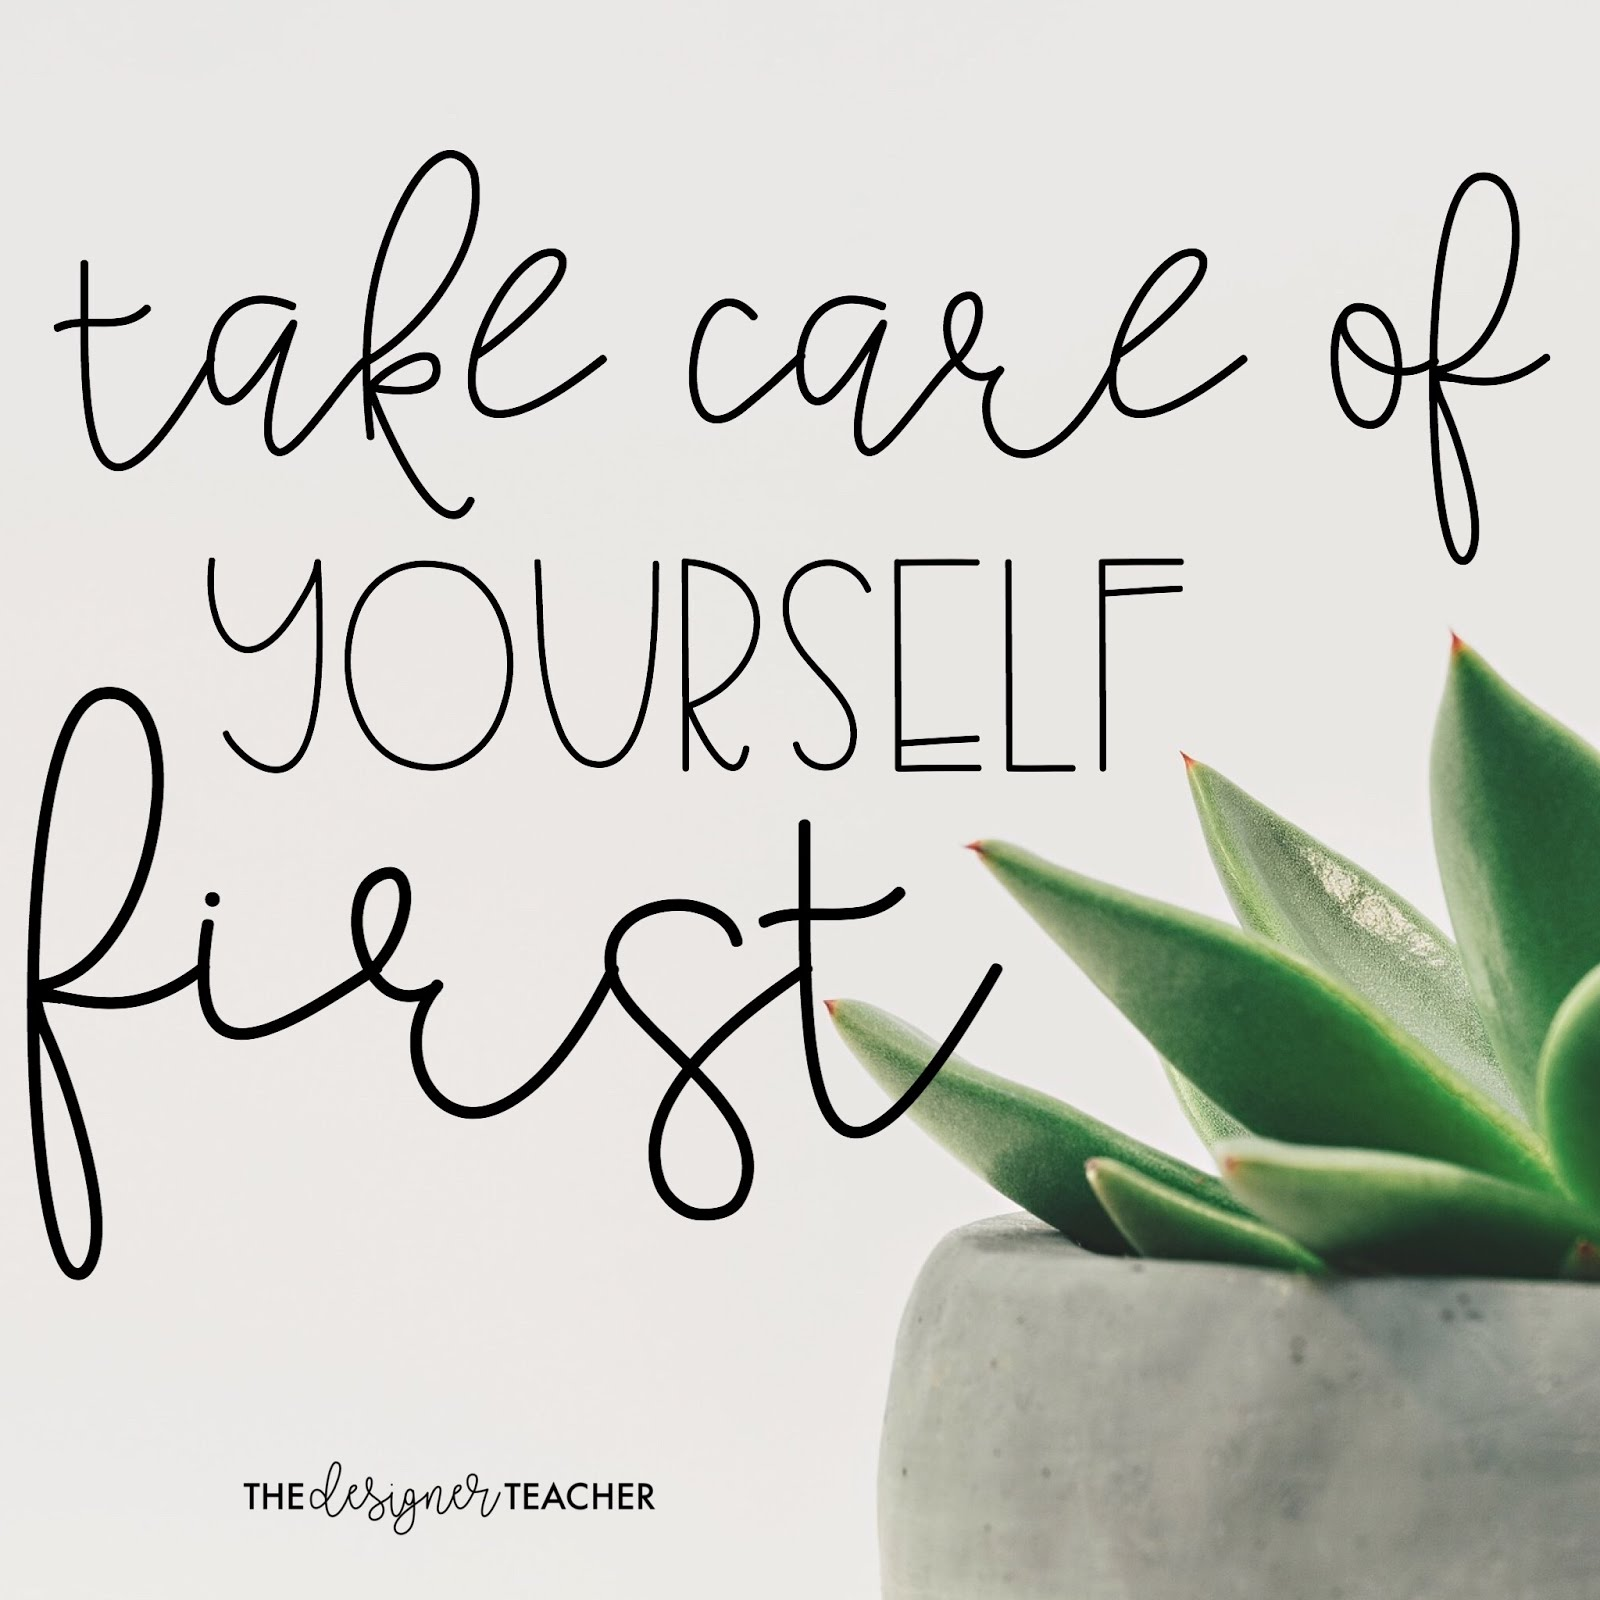 Self Image Quotes The Designer Teacher 5 Self Care Quotes For Teachers